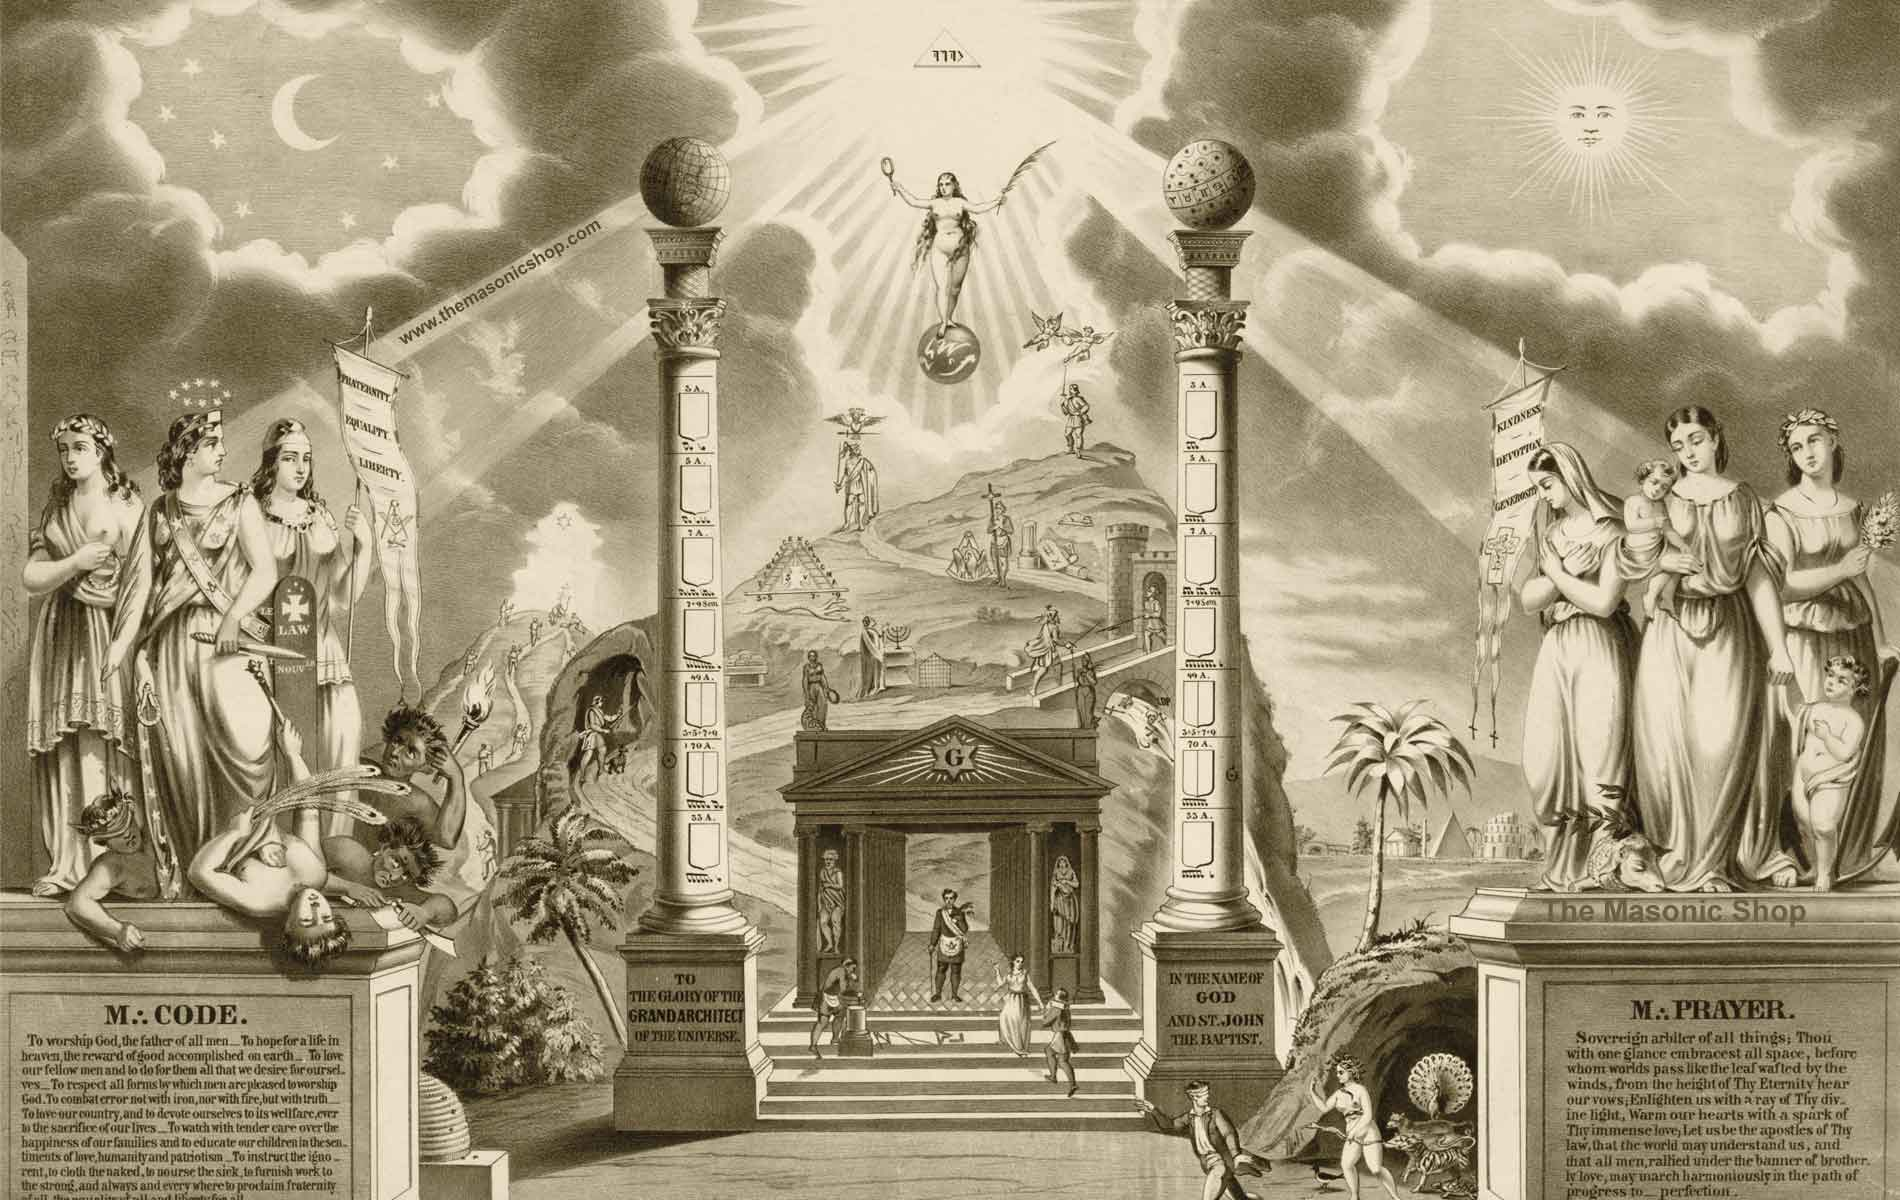 Masonic Wallpaper Courtesy of The Masonic Shop Page Five 1900x1200